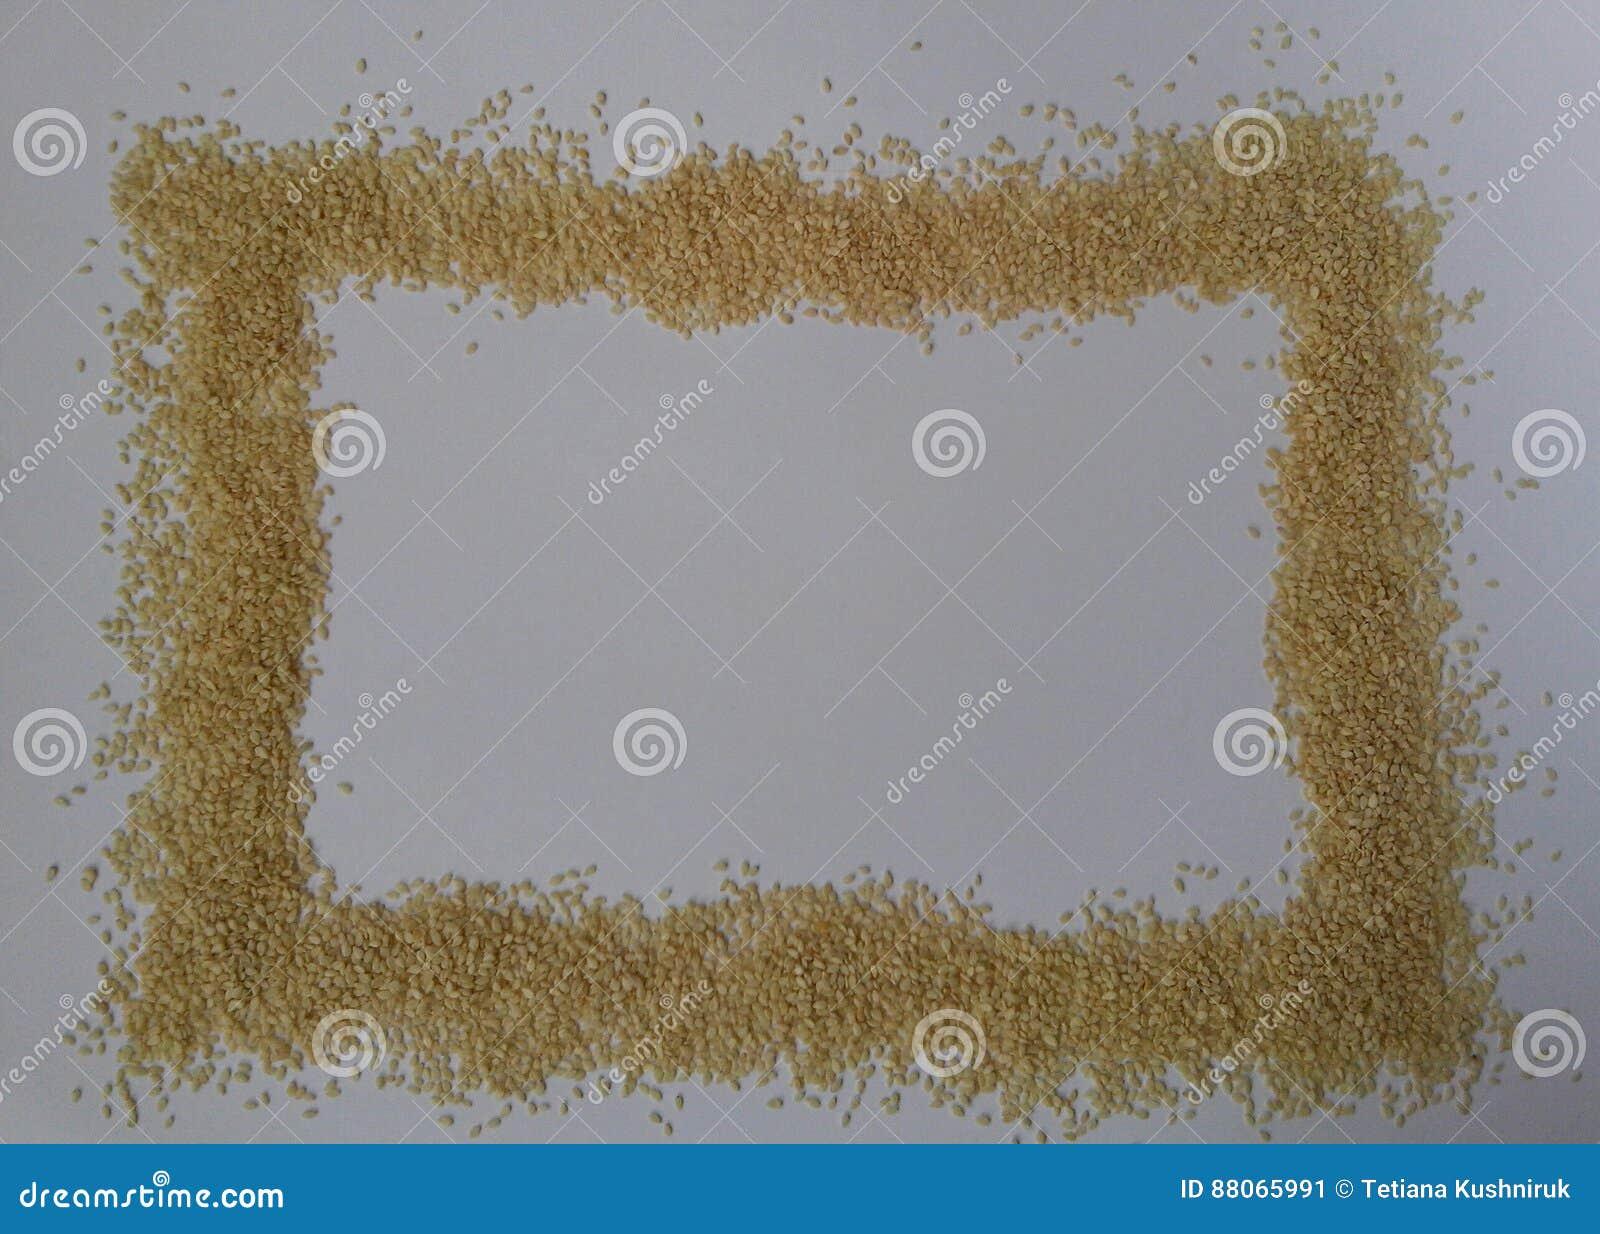 Sementes de sésamo no fundo branco textura clara Vista superior Isolado no branco Alimento